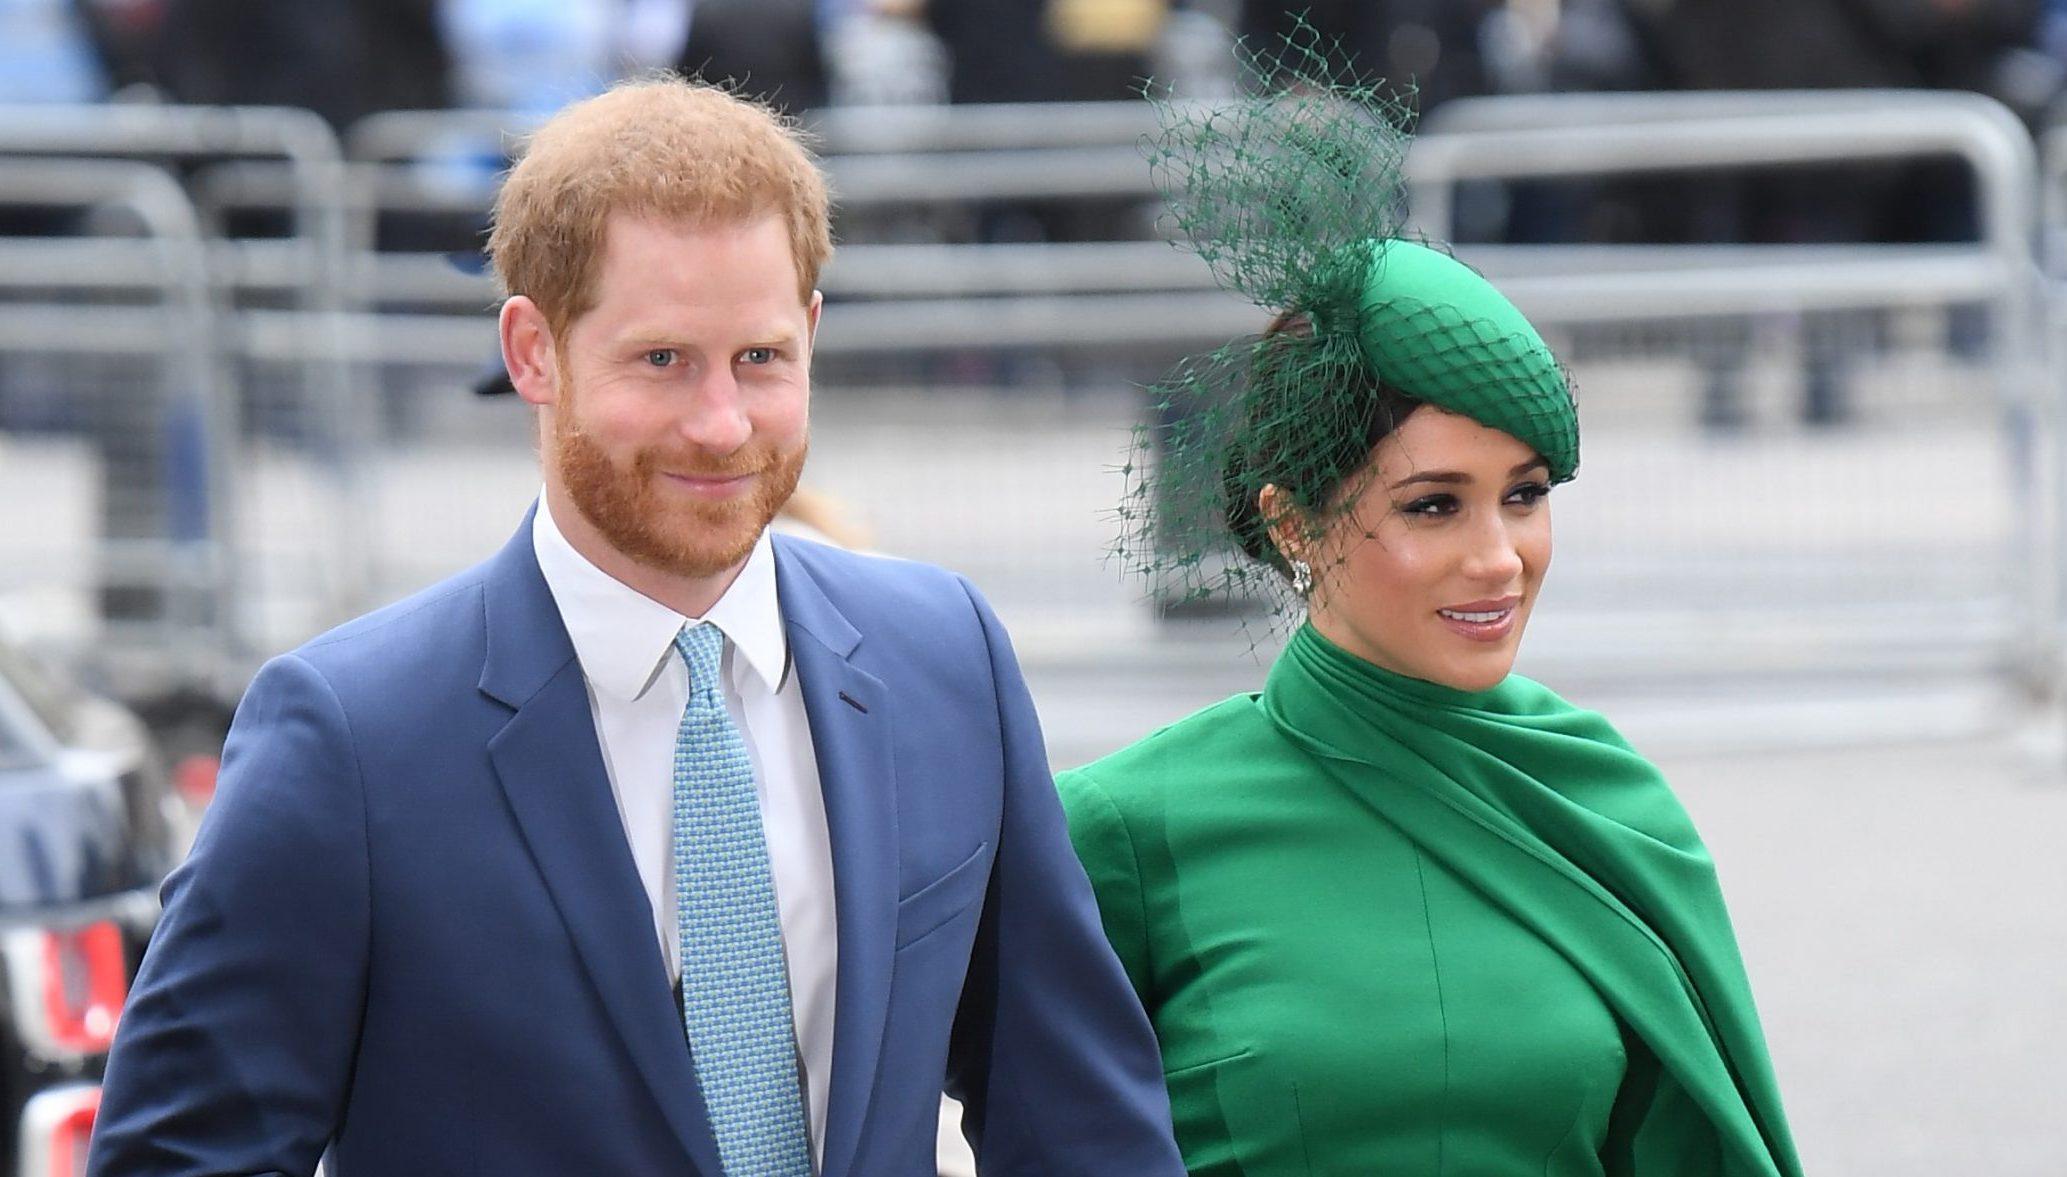 Coronavirus: Prince Harry and Meghan Markle's supportive statement slammed